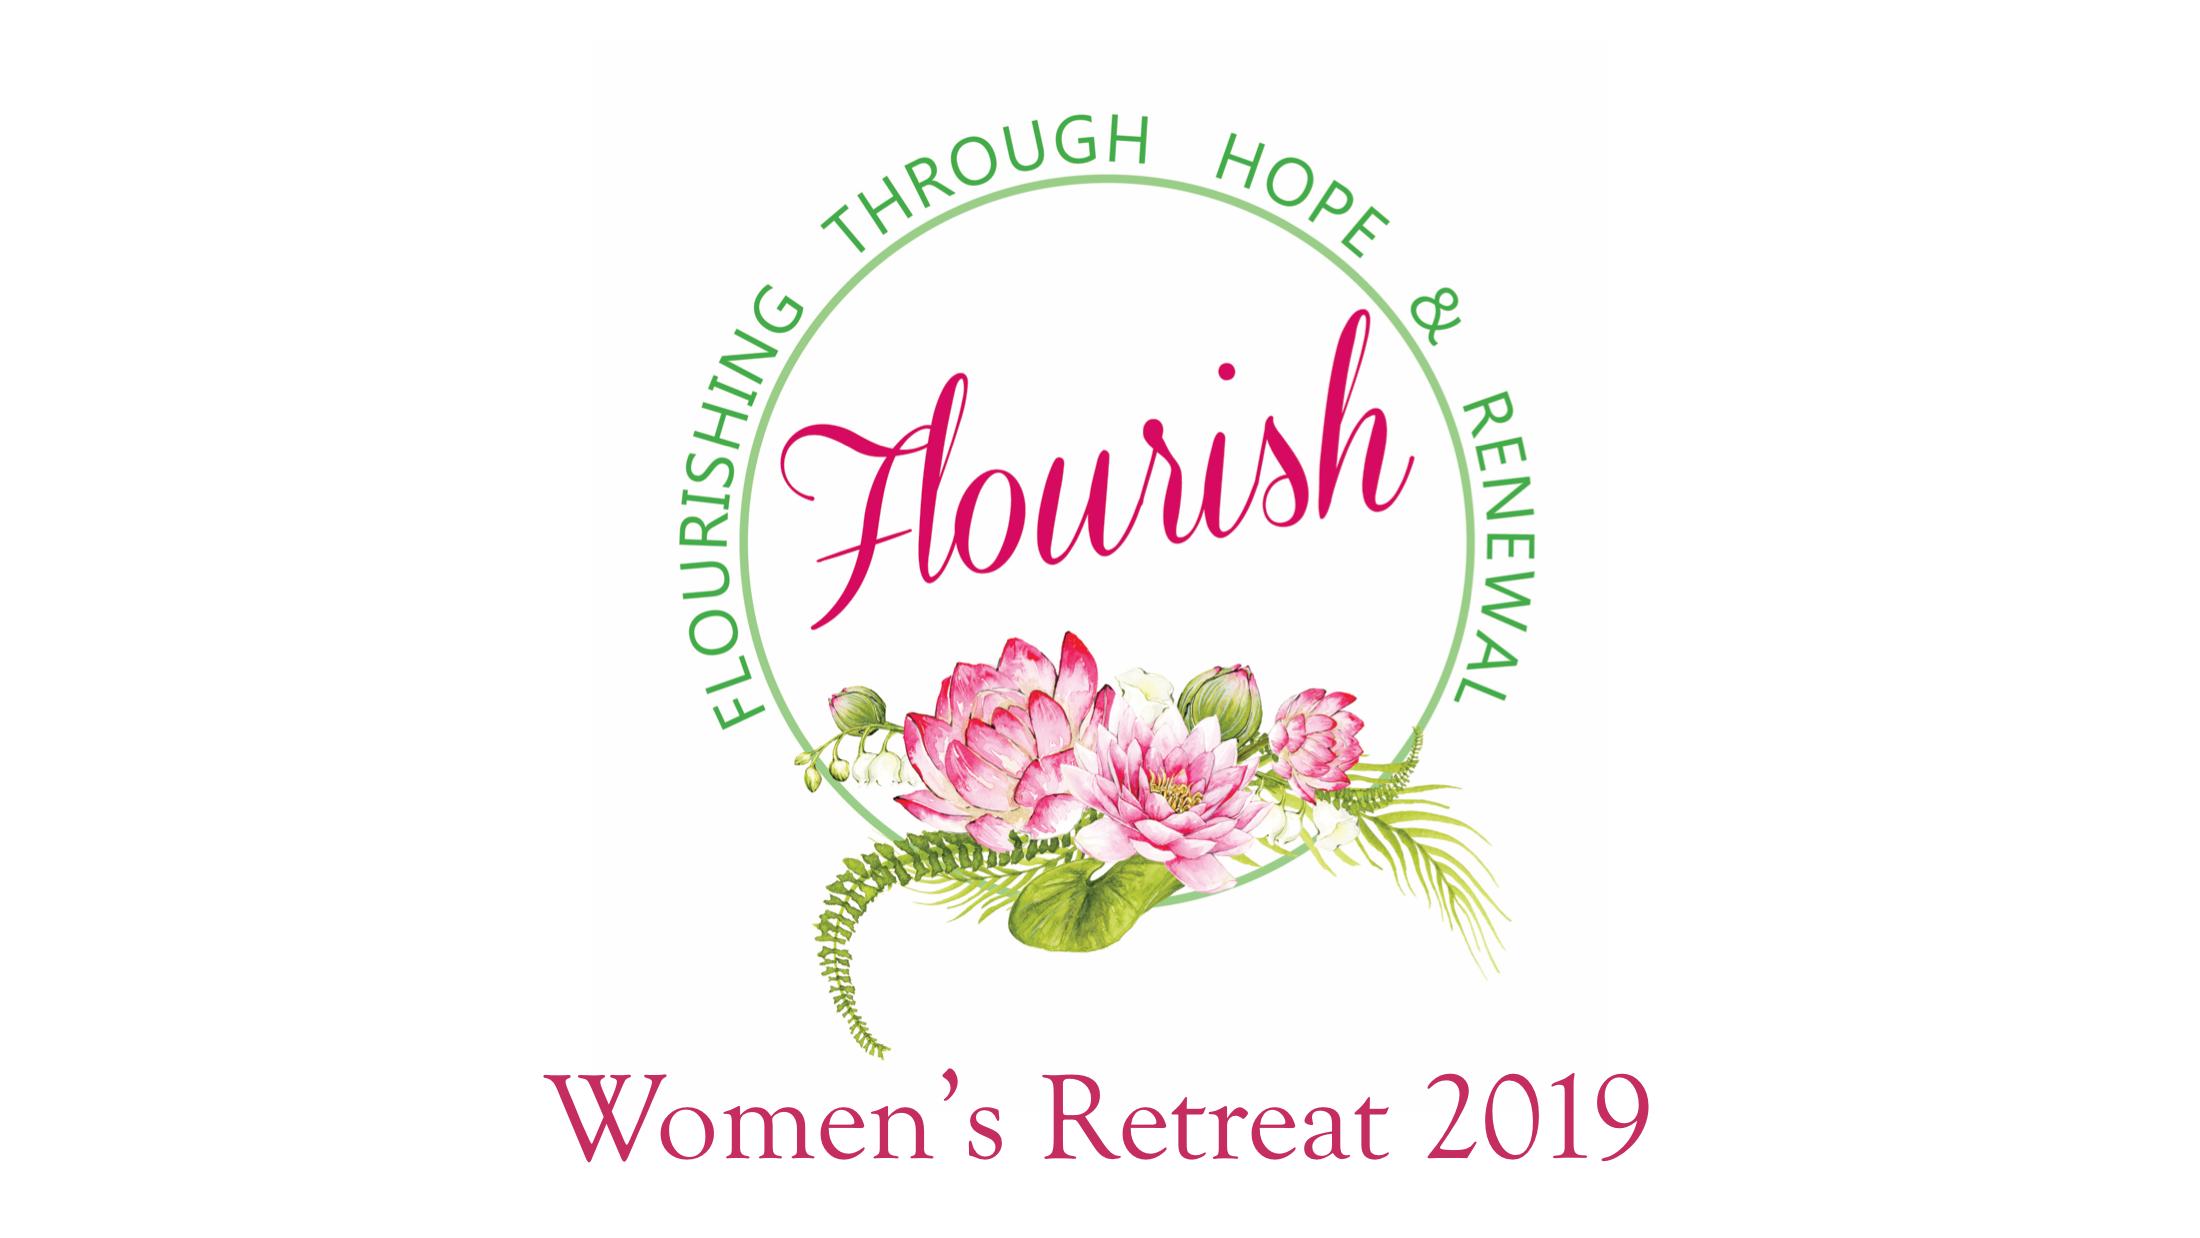 Women's Retreat 2019 WEB.png